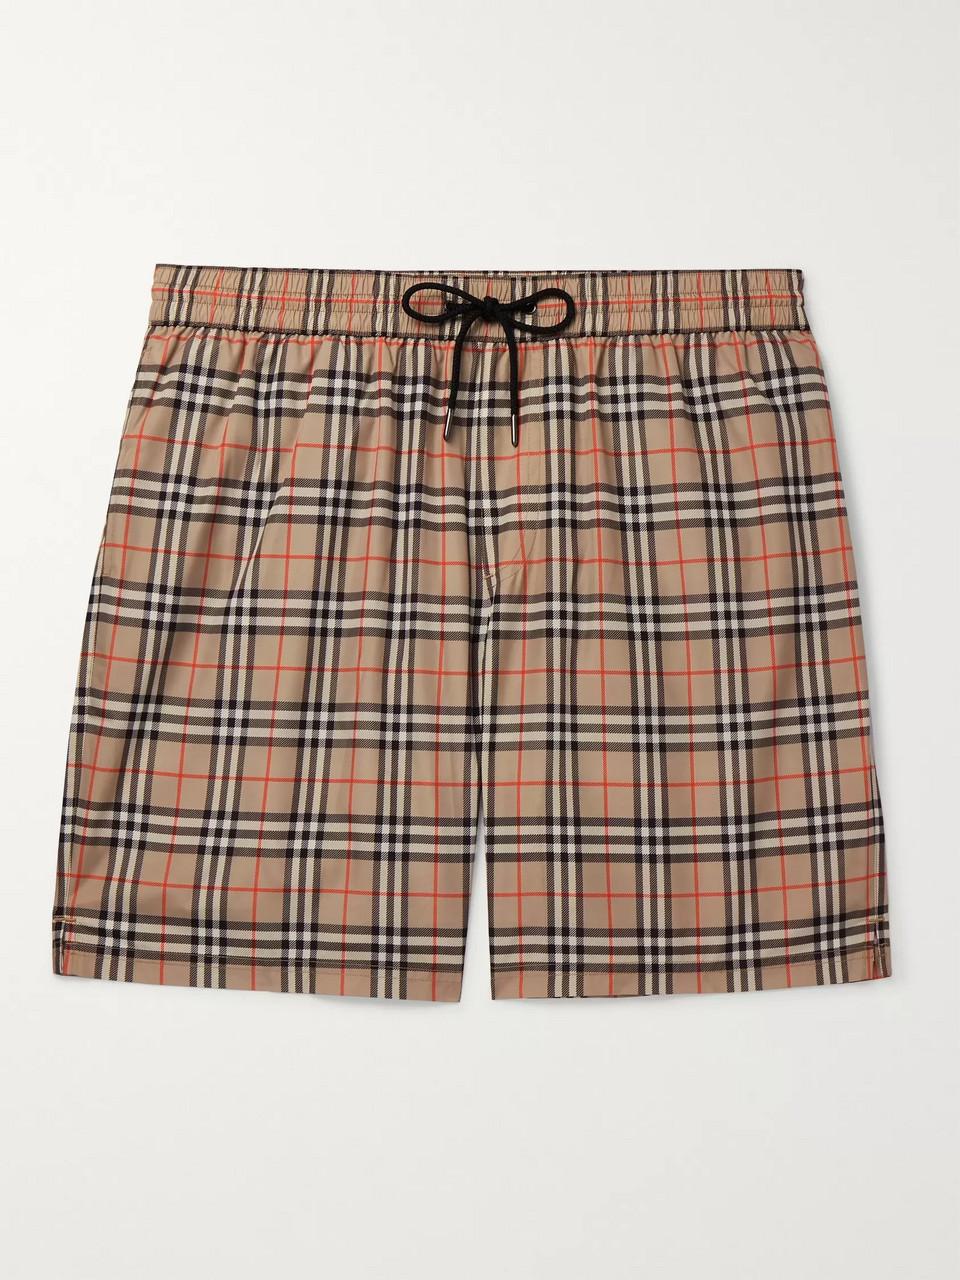 19371050ac Swim Shorts & Swimwear   Designer Menswear   MR PORTER